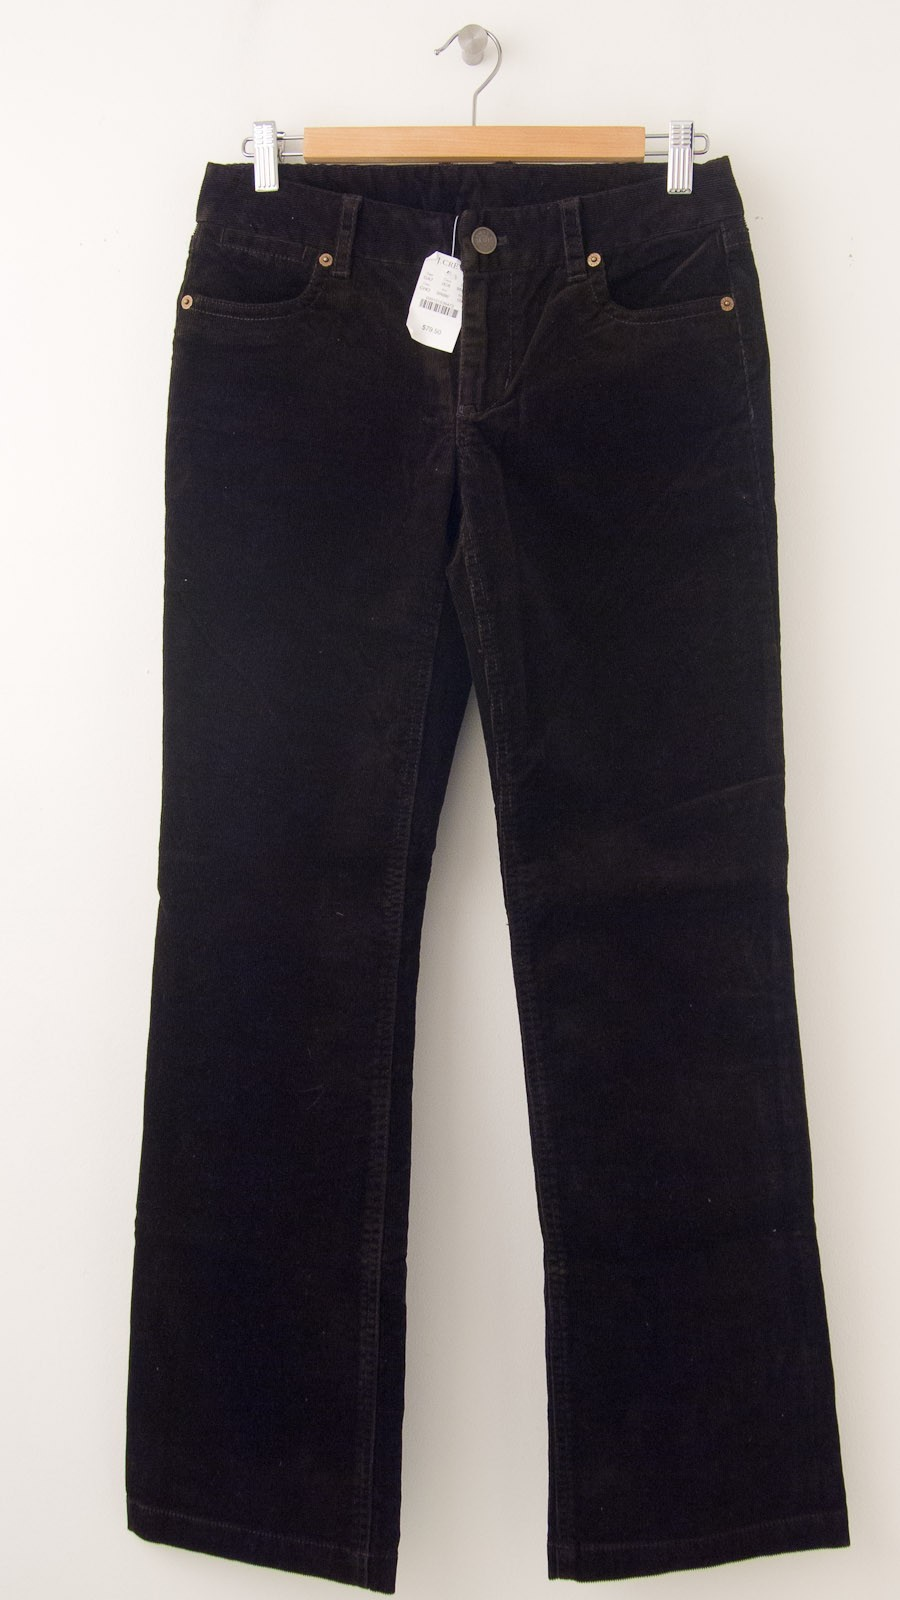 9c7fd39b915 J. Crew Stretch Vintage Favorite Fit Bootcut Cord Corduroy Pants ...